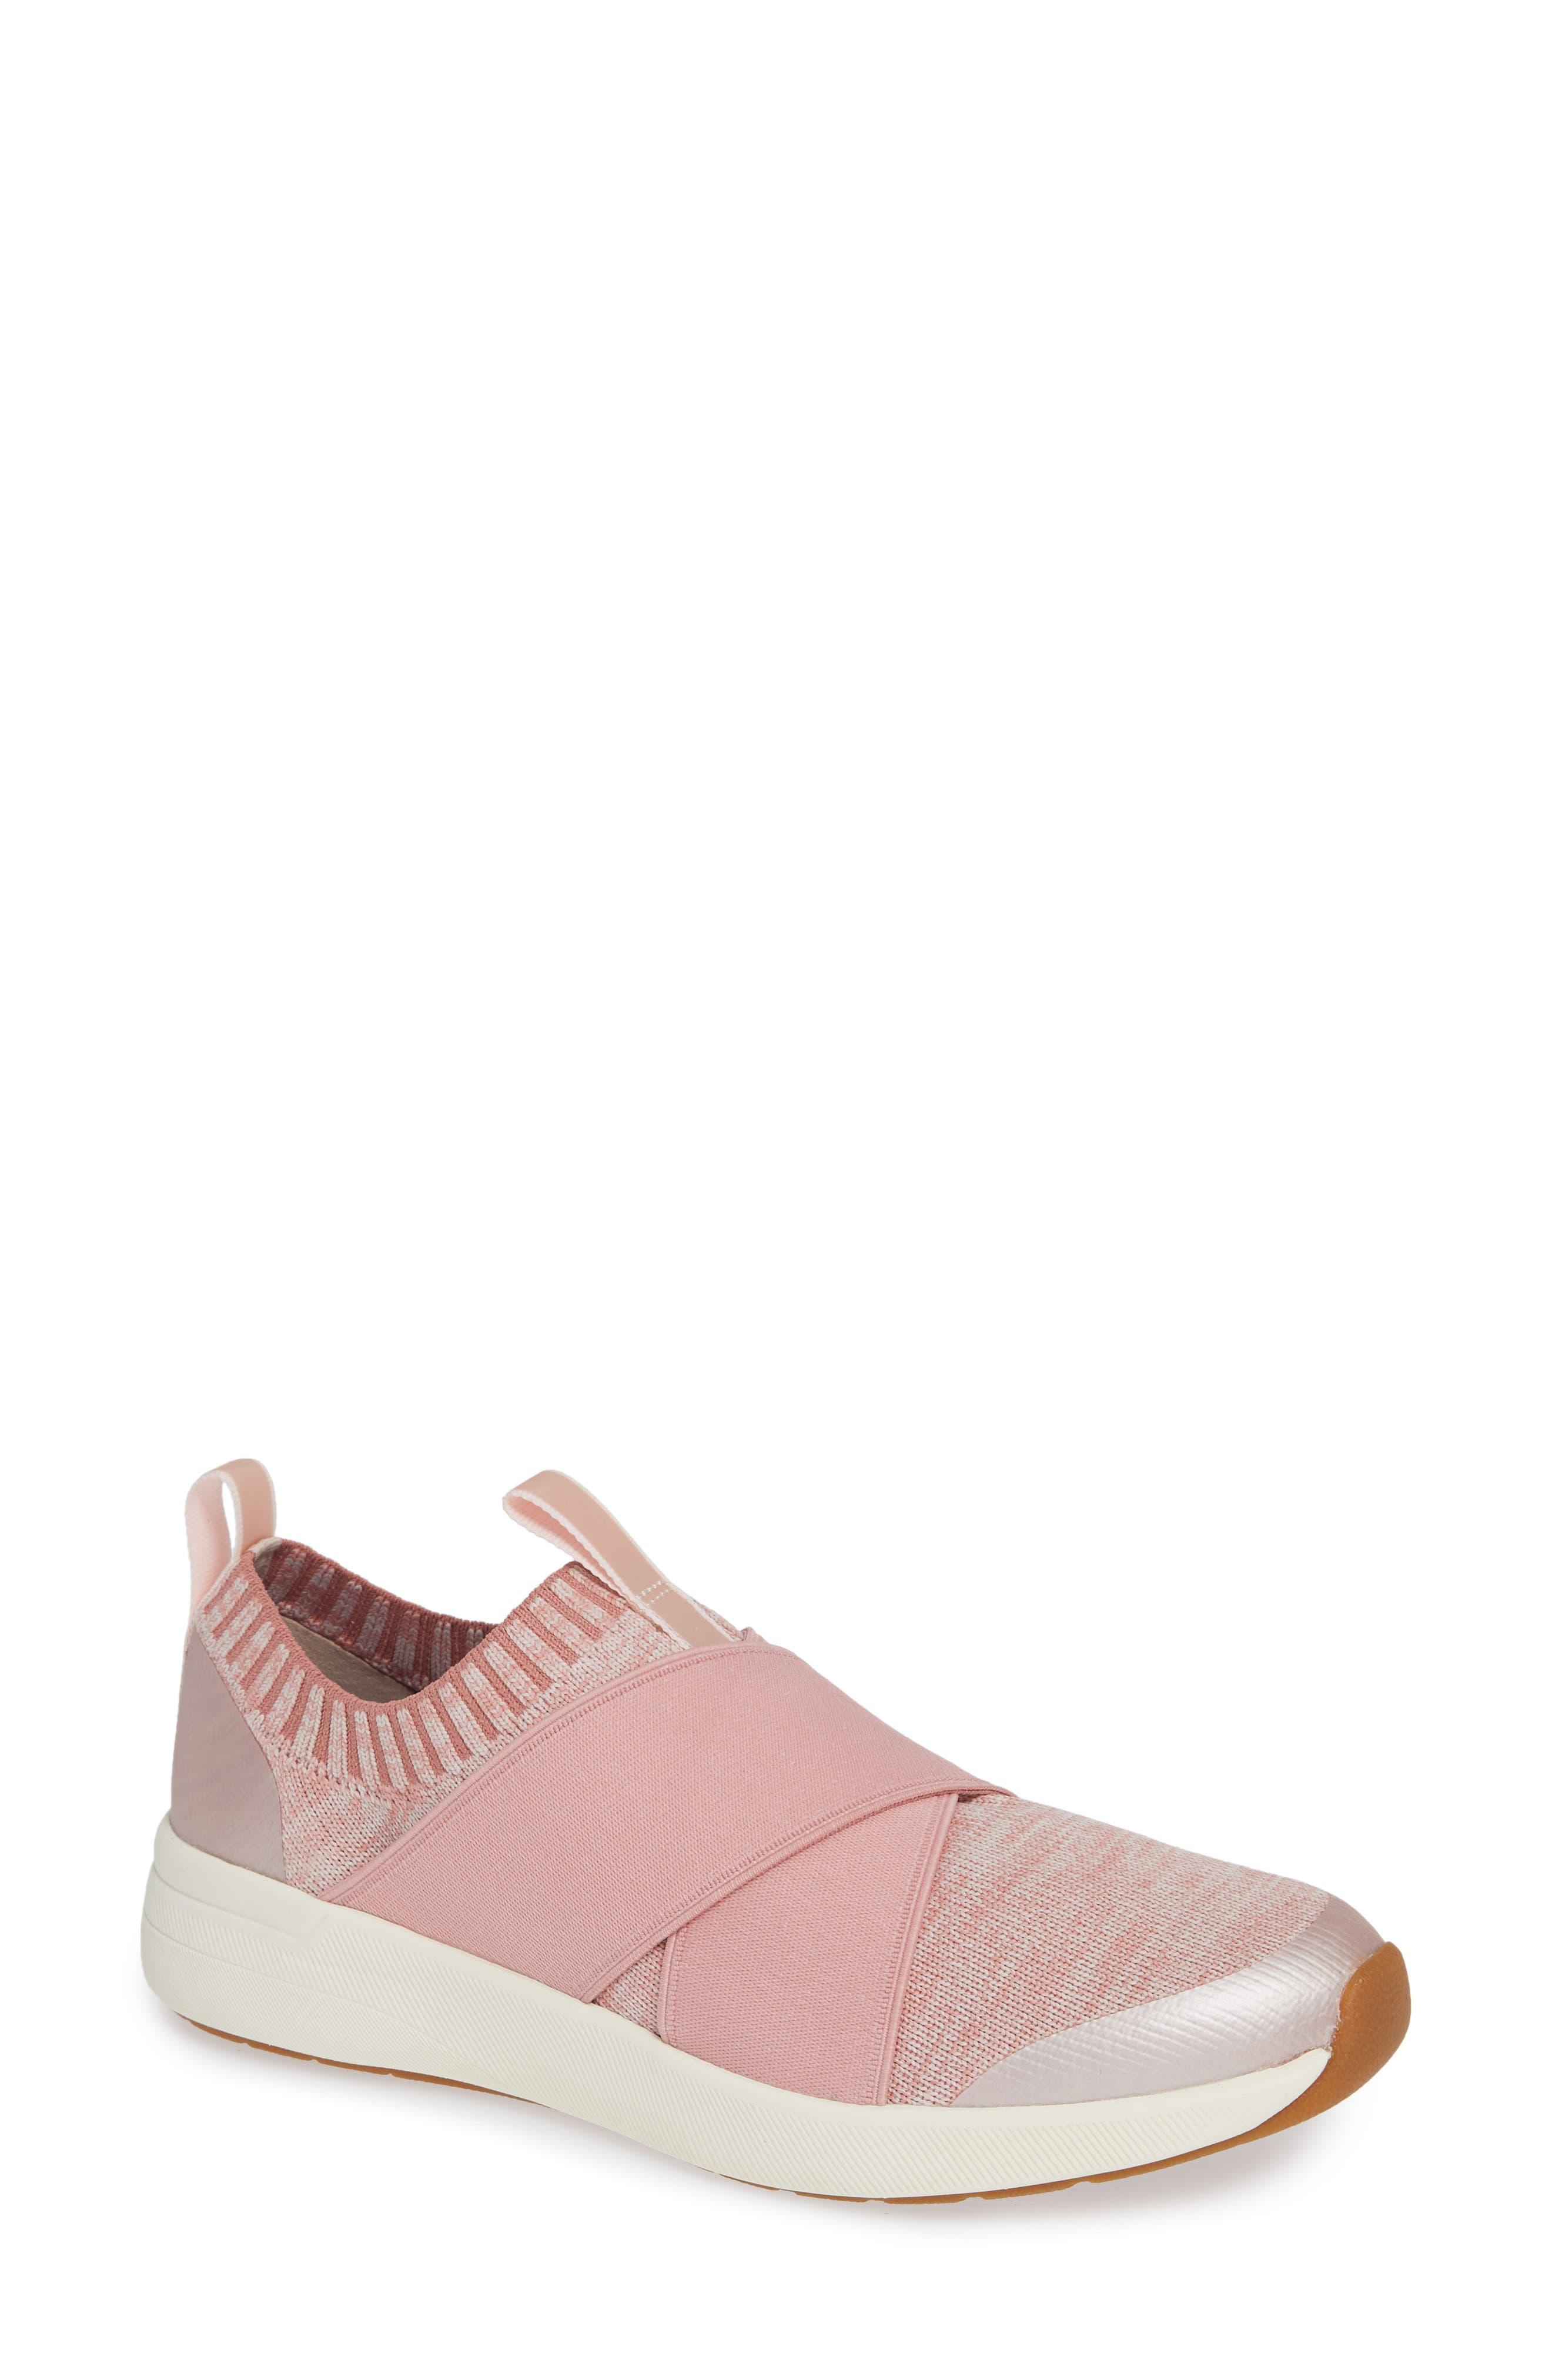 KEDS<SUP>®</SUP>,                             Studio Jumper Knit Sneaker,                             Main thumbnail 1, color,                             LIGHT PINK